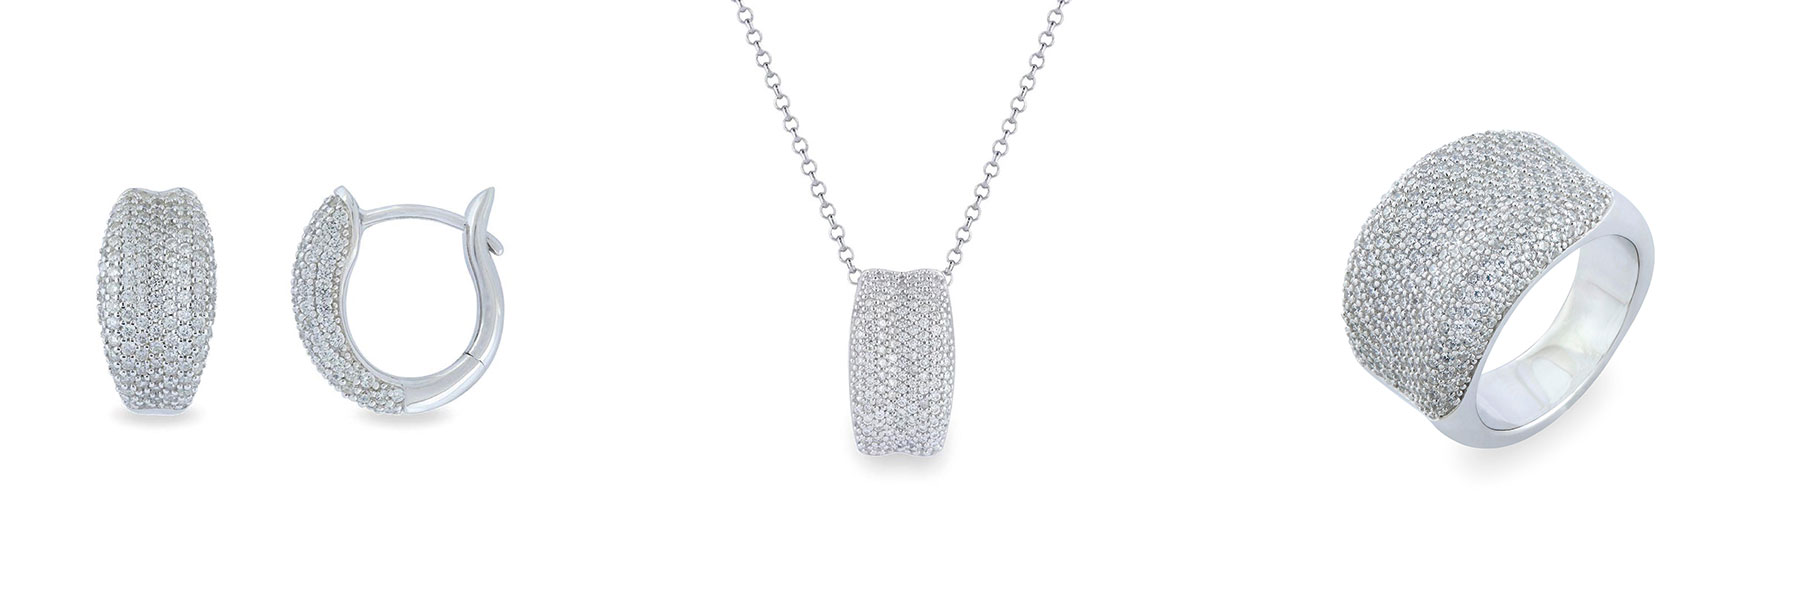 Vilmas Starlight Kollektion - Juwelier Hilgers Essen